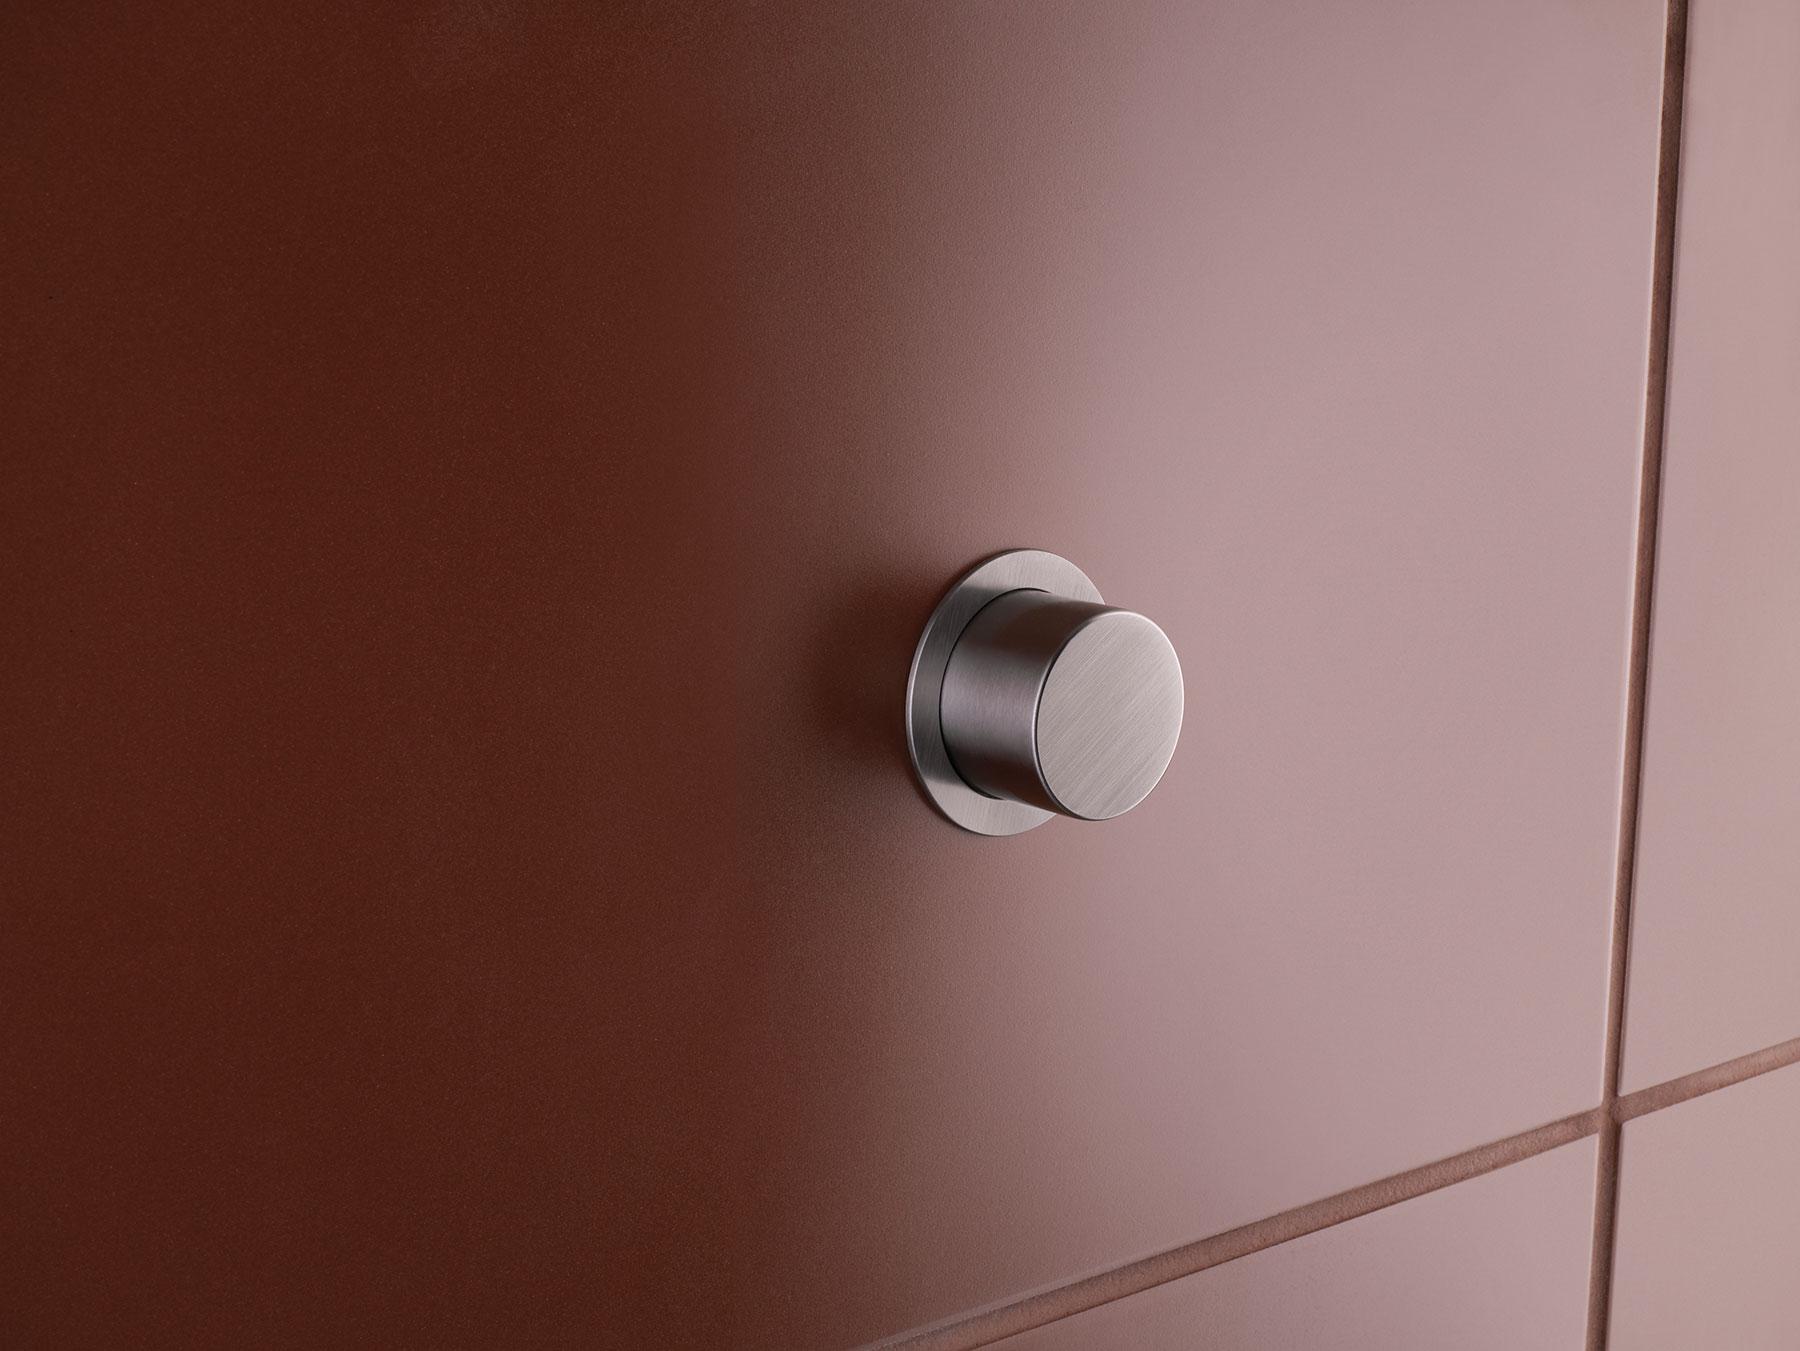 Modern Vola Wall Mount Push Button